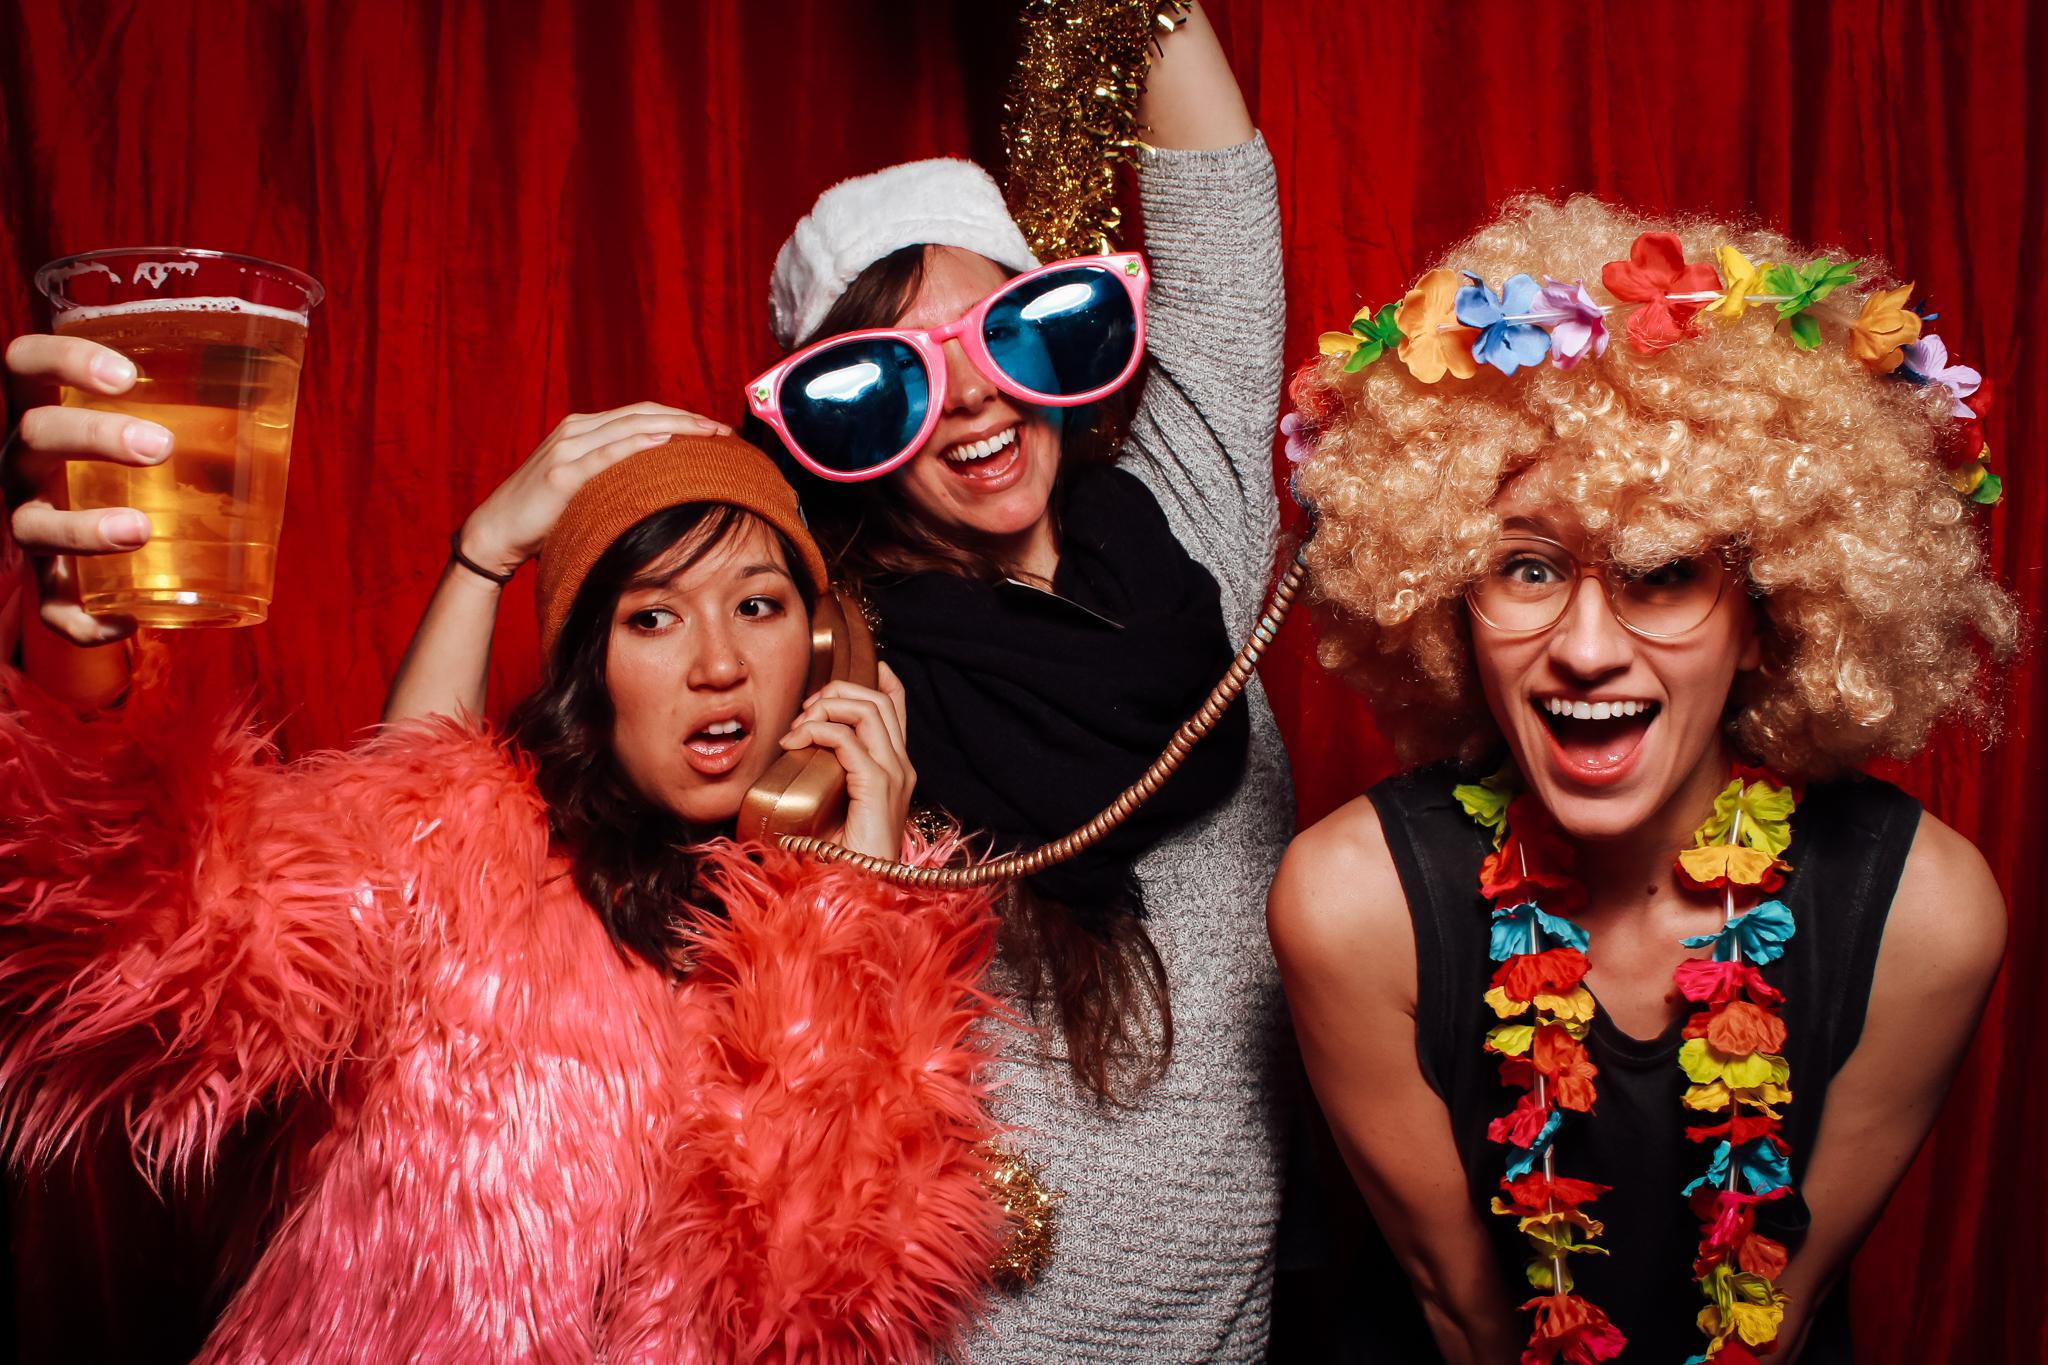 faroutphotobooths-memphis-photobooth-rental-launch-party-loflin-yard (12 of 16).jpg